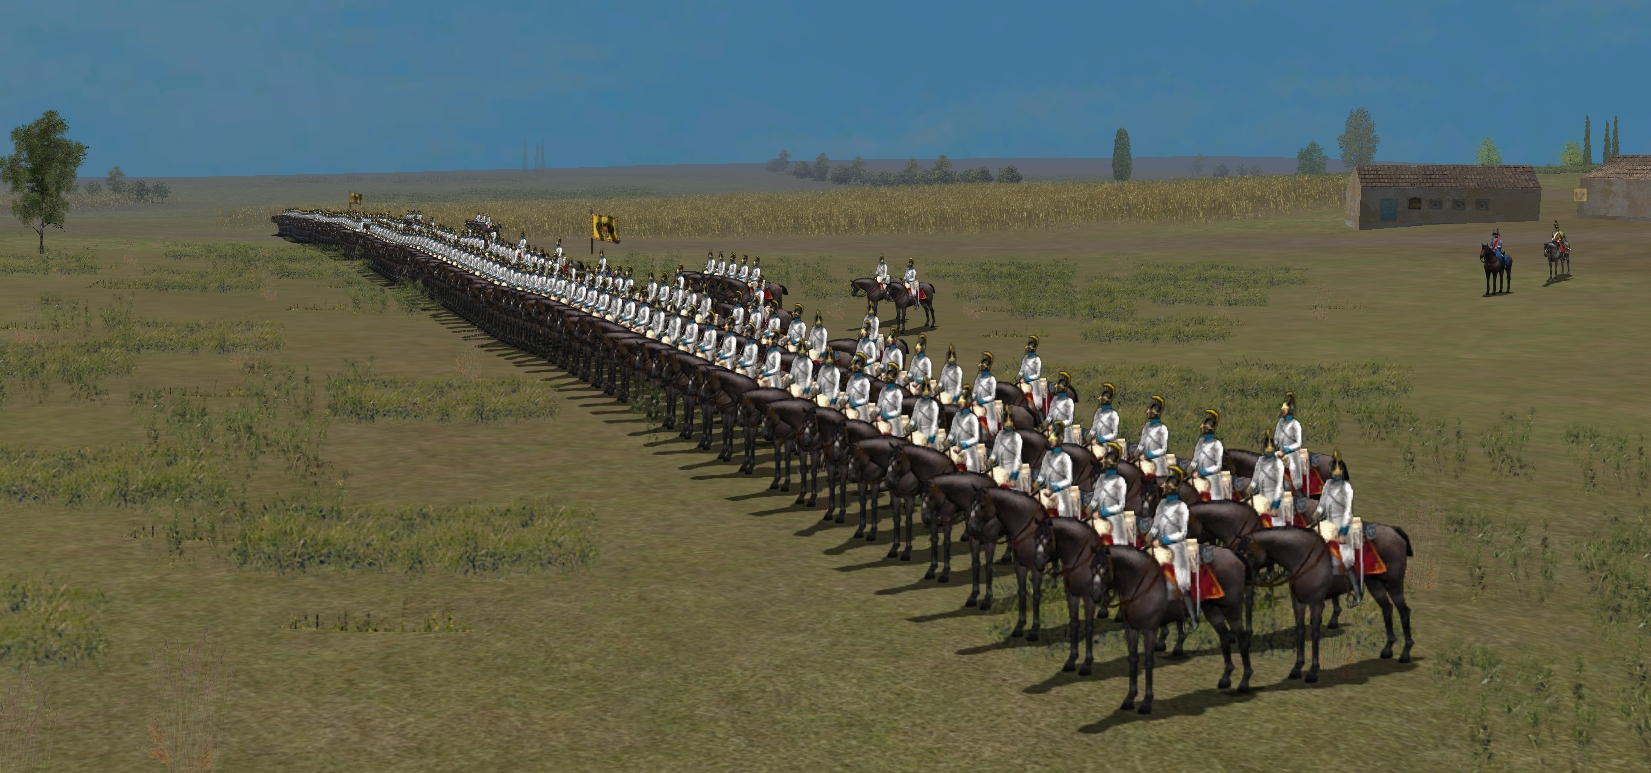 1805 Campaign on the Danube Screen0008